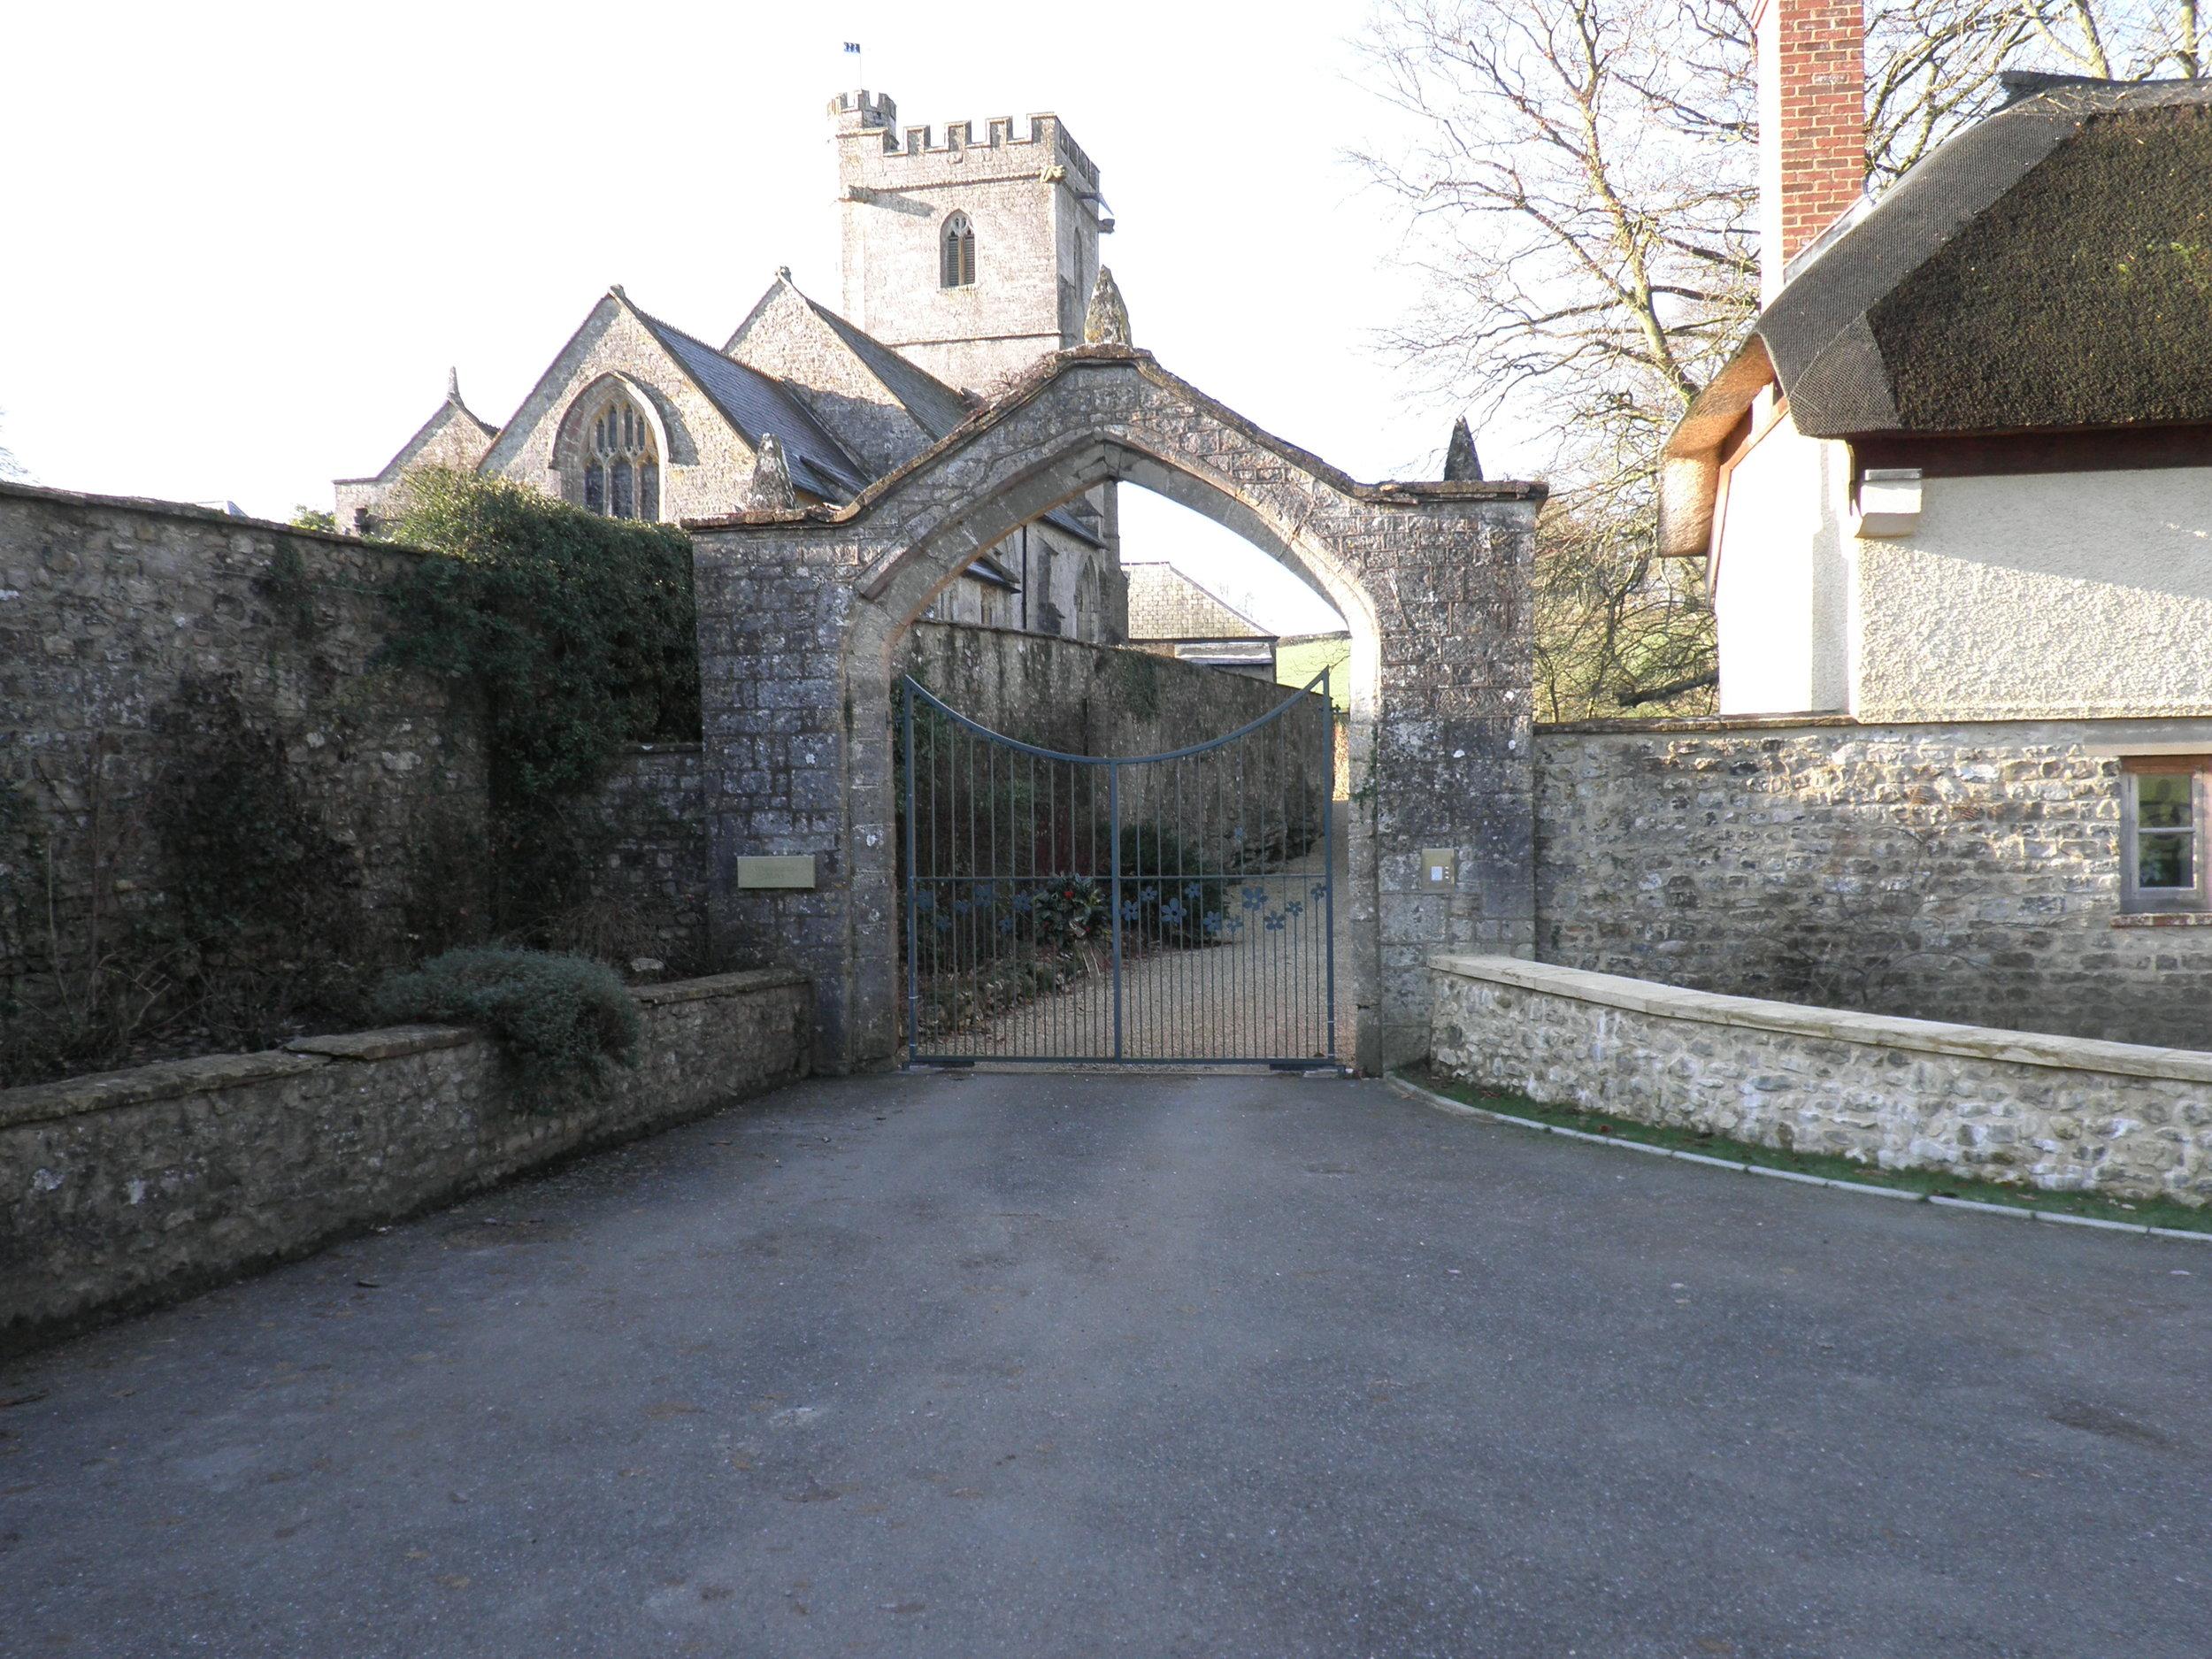 Archway Convex Gates